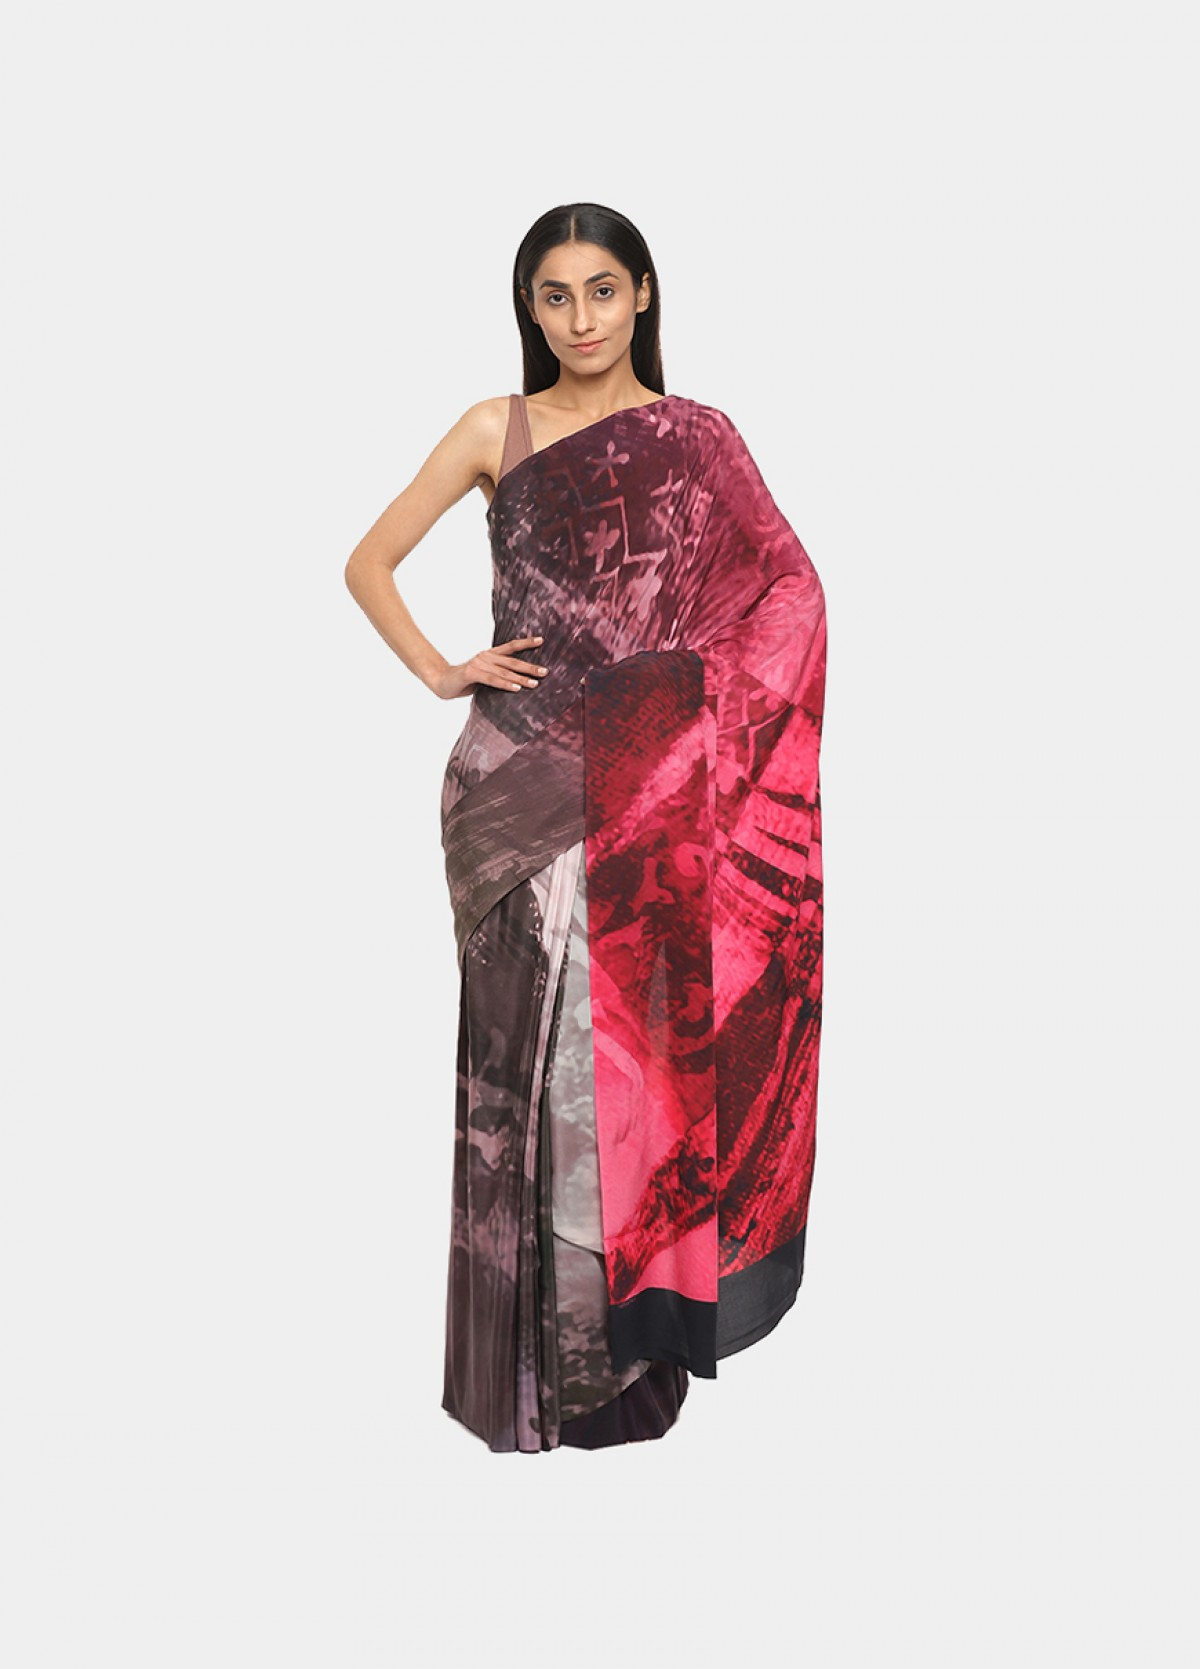 The Sindhu Sari